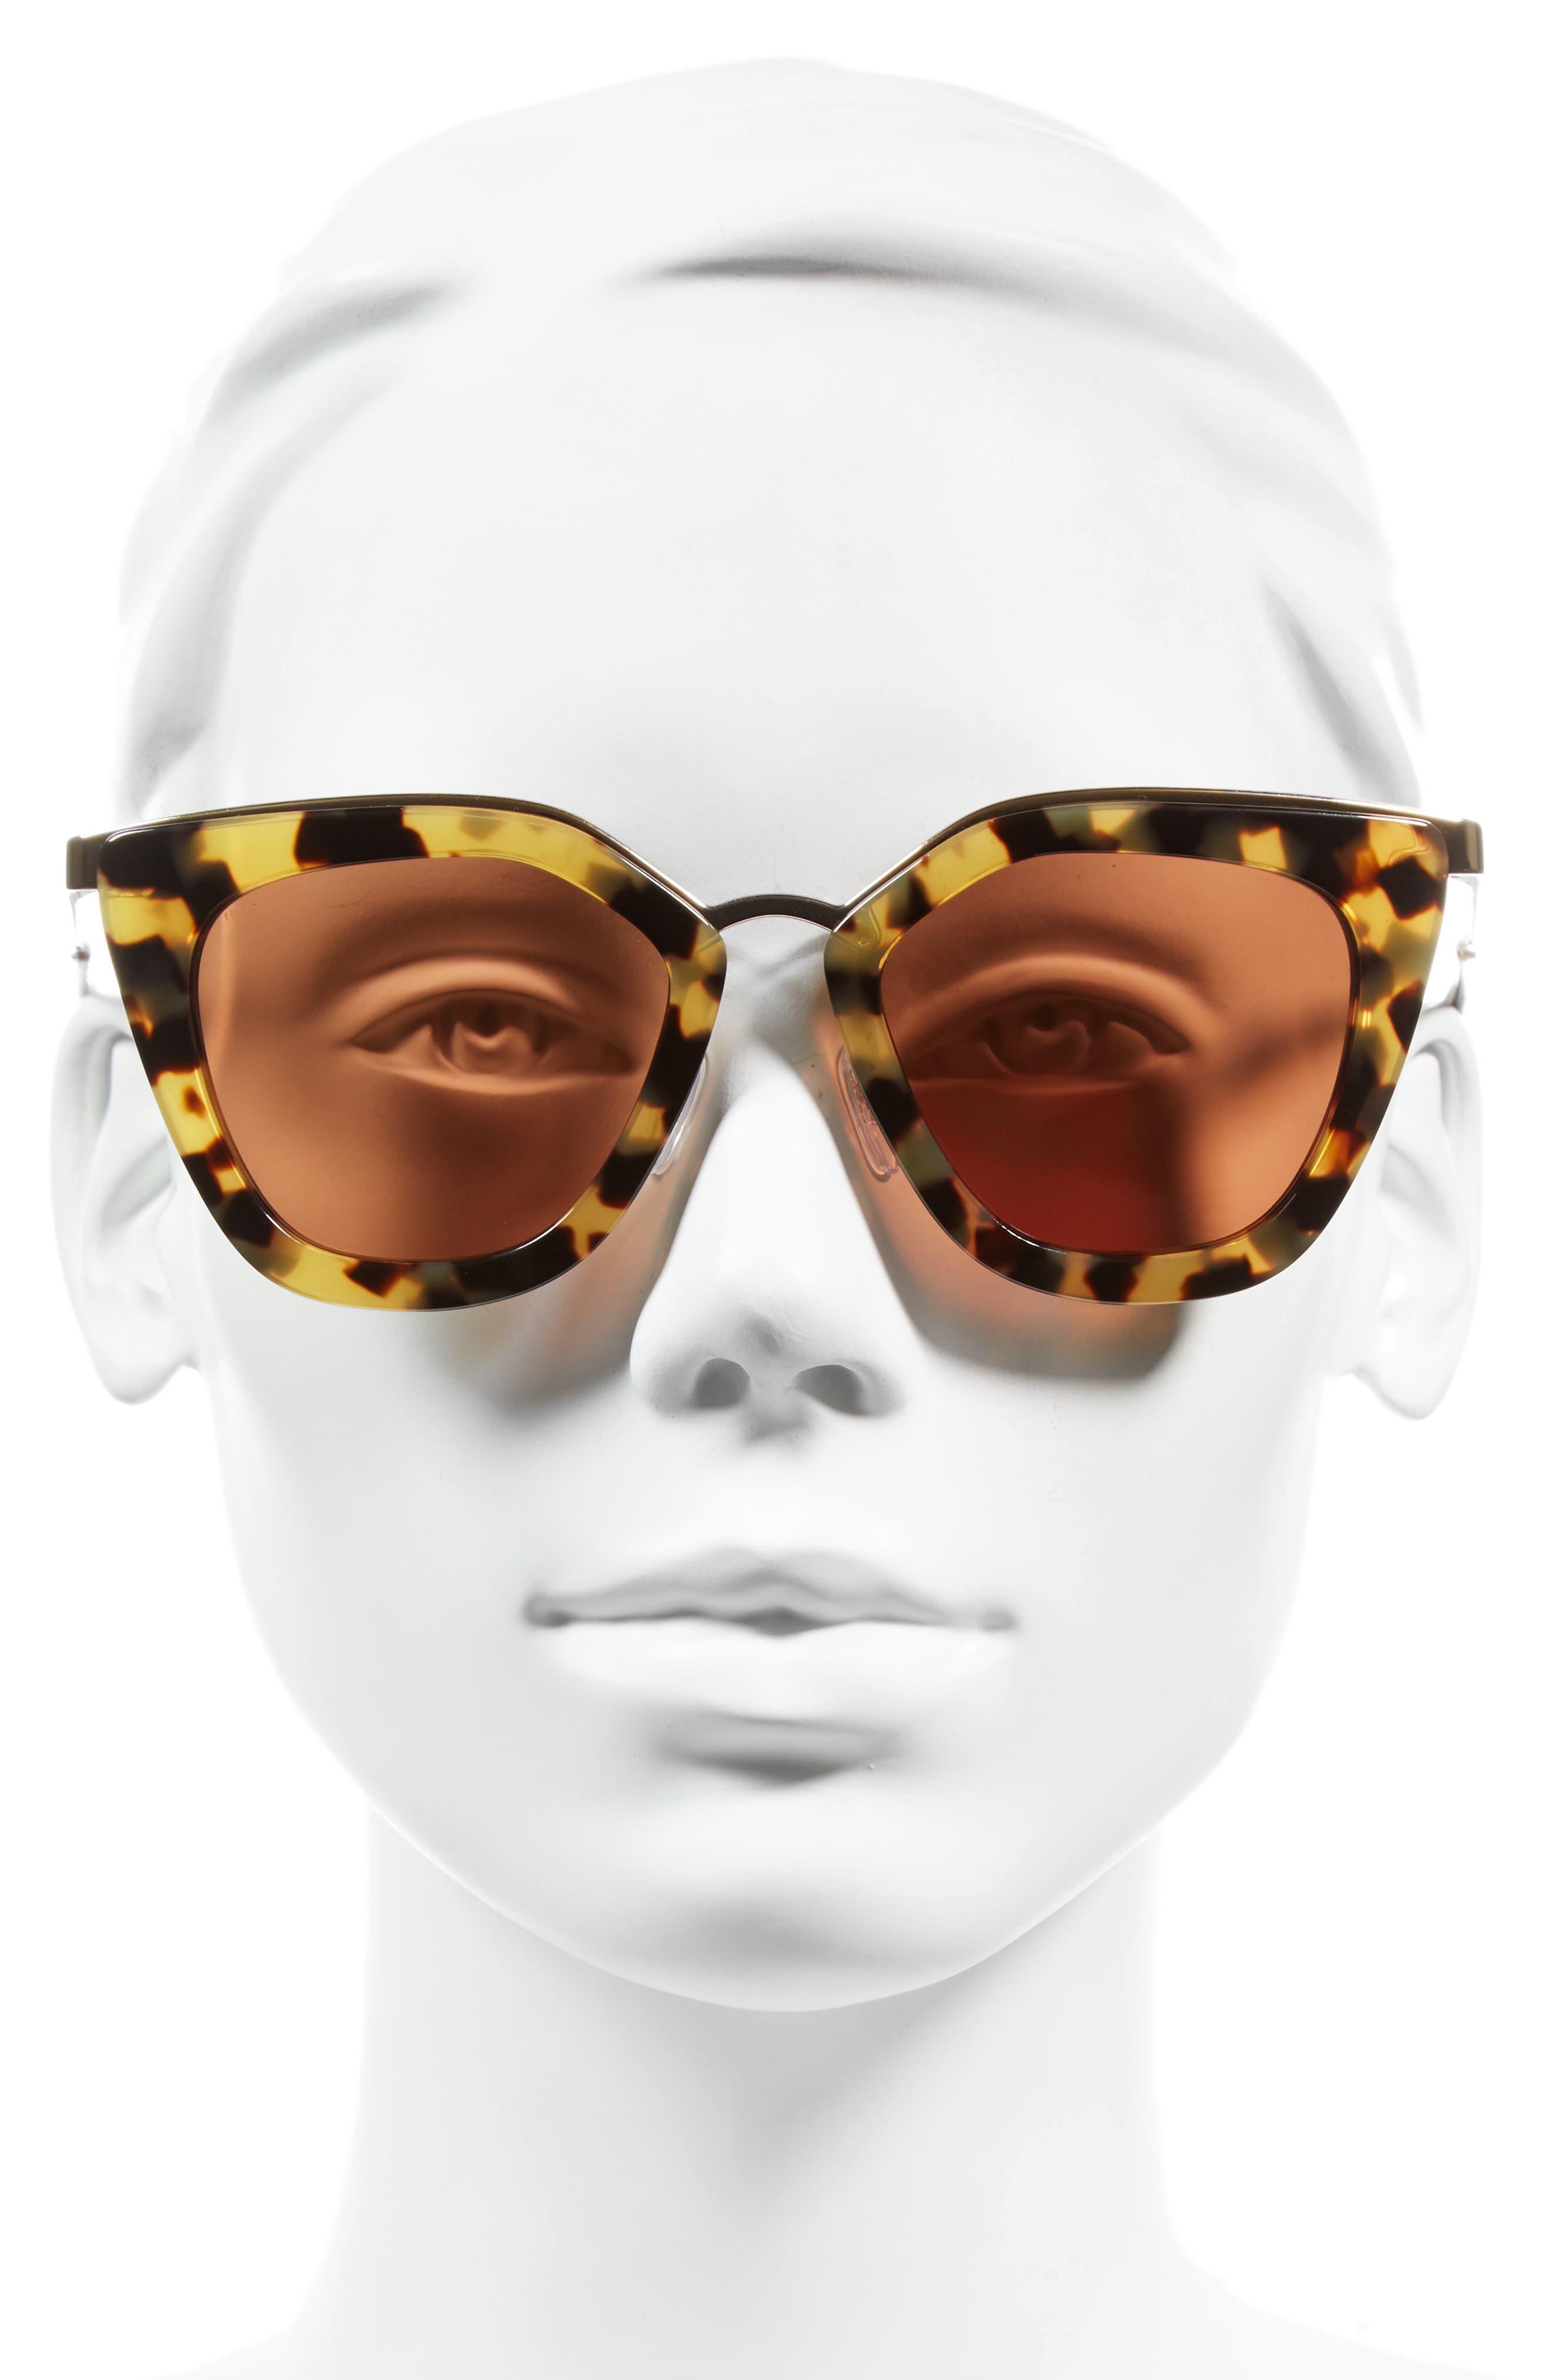 52mm Layered Frame Sunglasses,                             Alternate thumbnail 4, color,